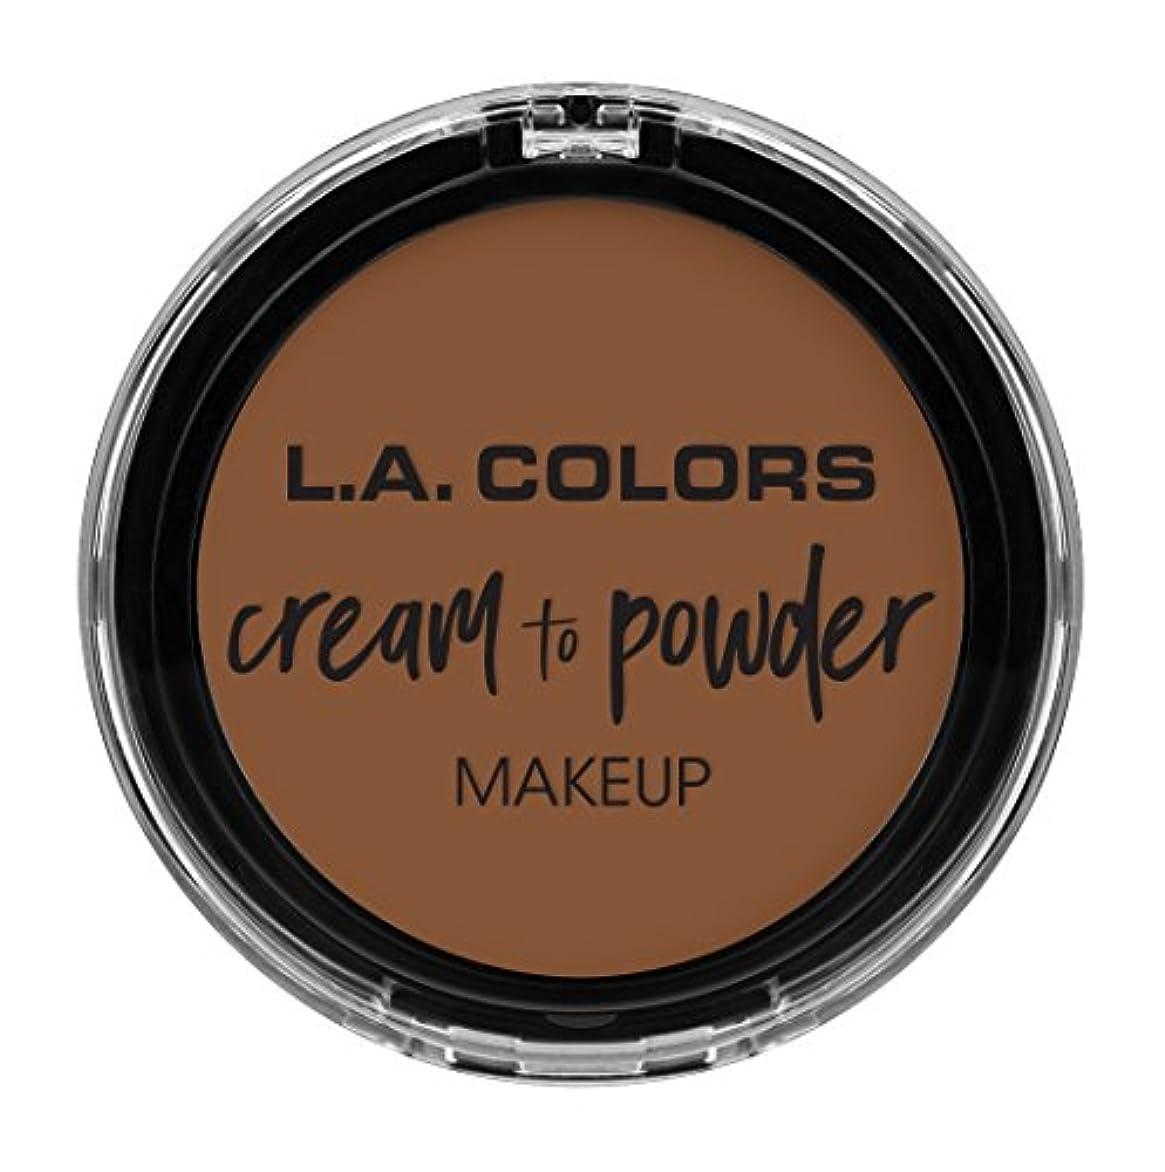 L.A. COLORS Cream To Powder Foundation - Toast (並行輸入品)